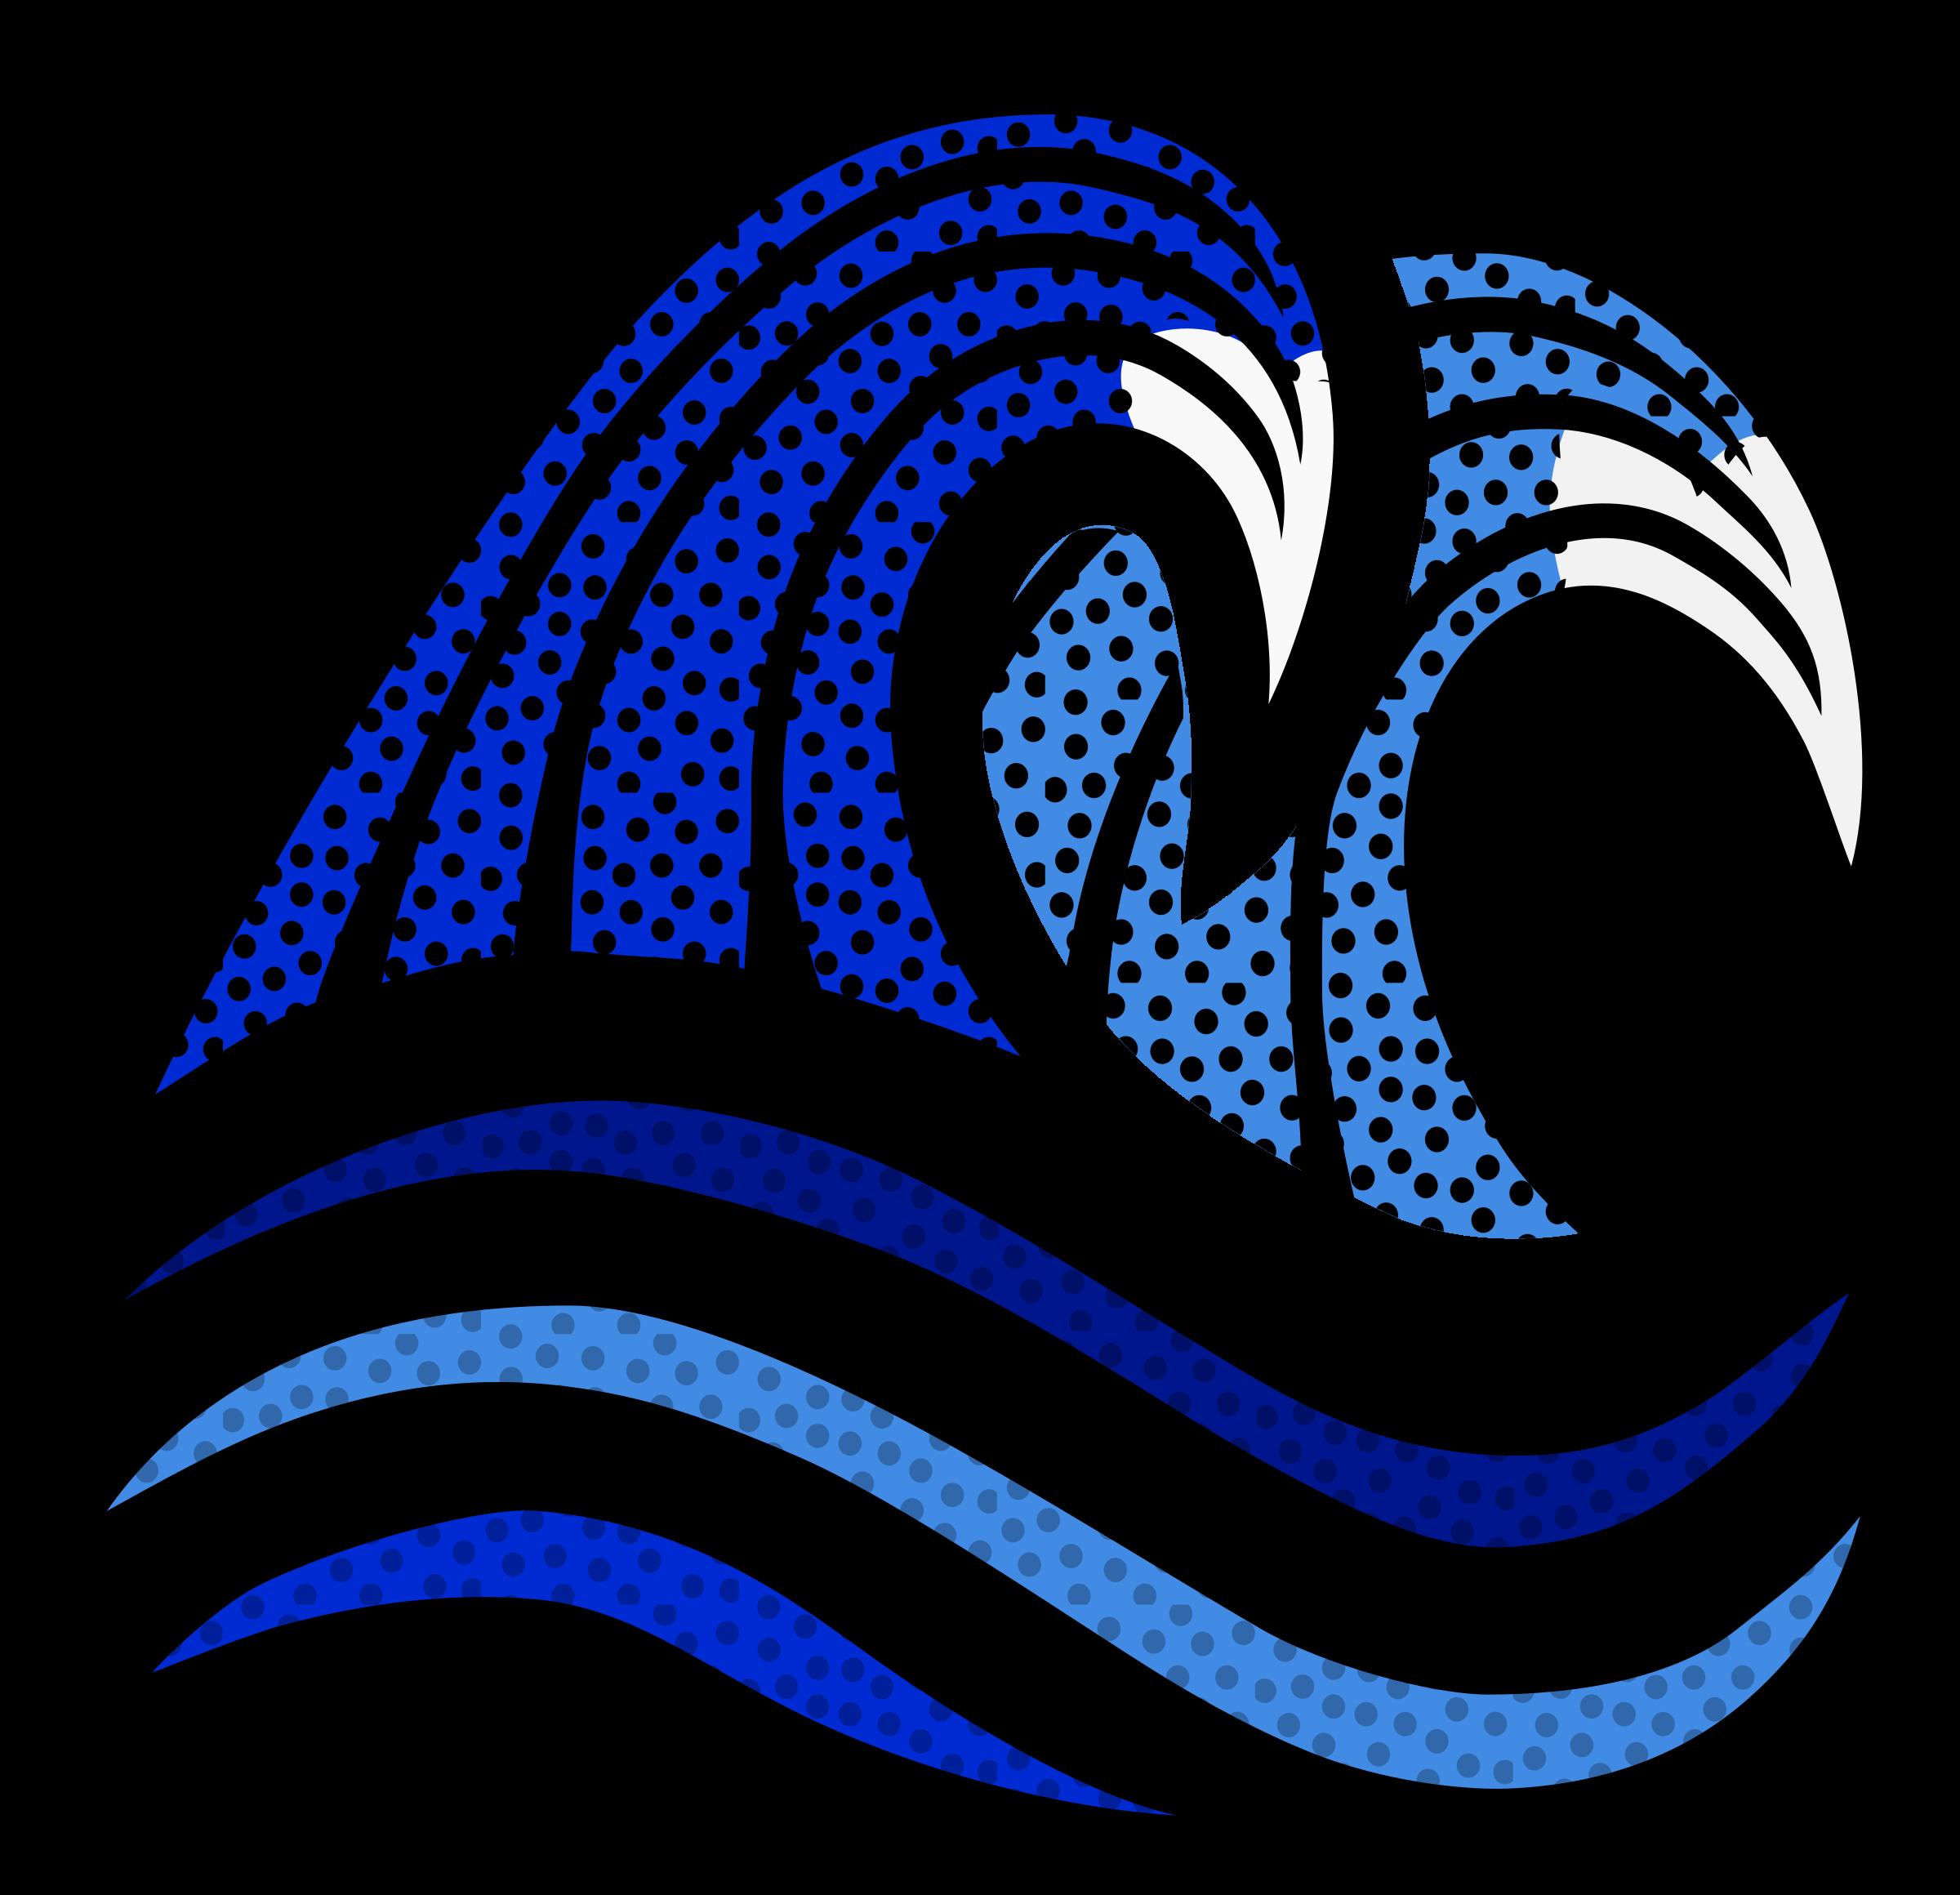 Coloured big image png. Waves clipart symbol